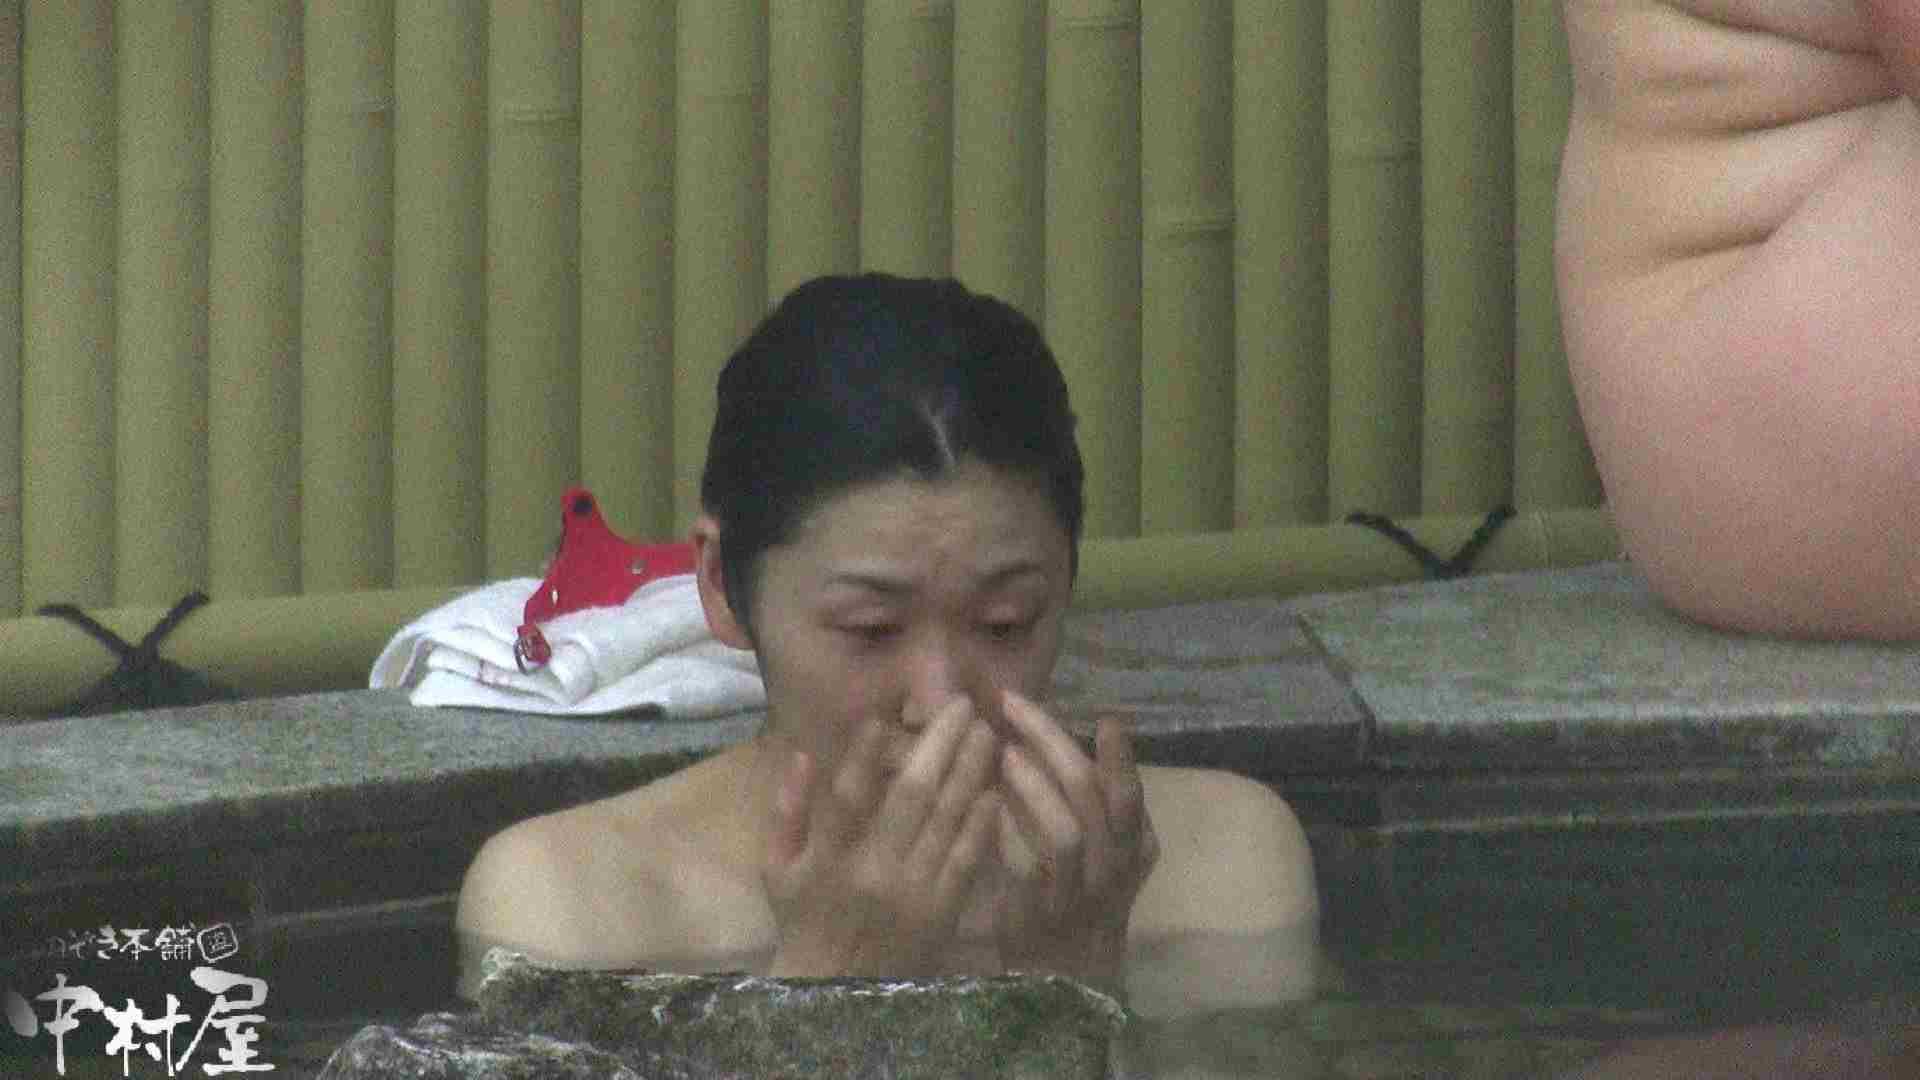 Aquaな露天風呂Vol.917 露天 セックス無修正動画無料 102画像 38